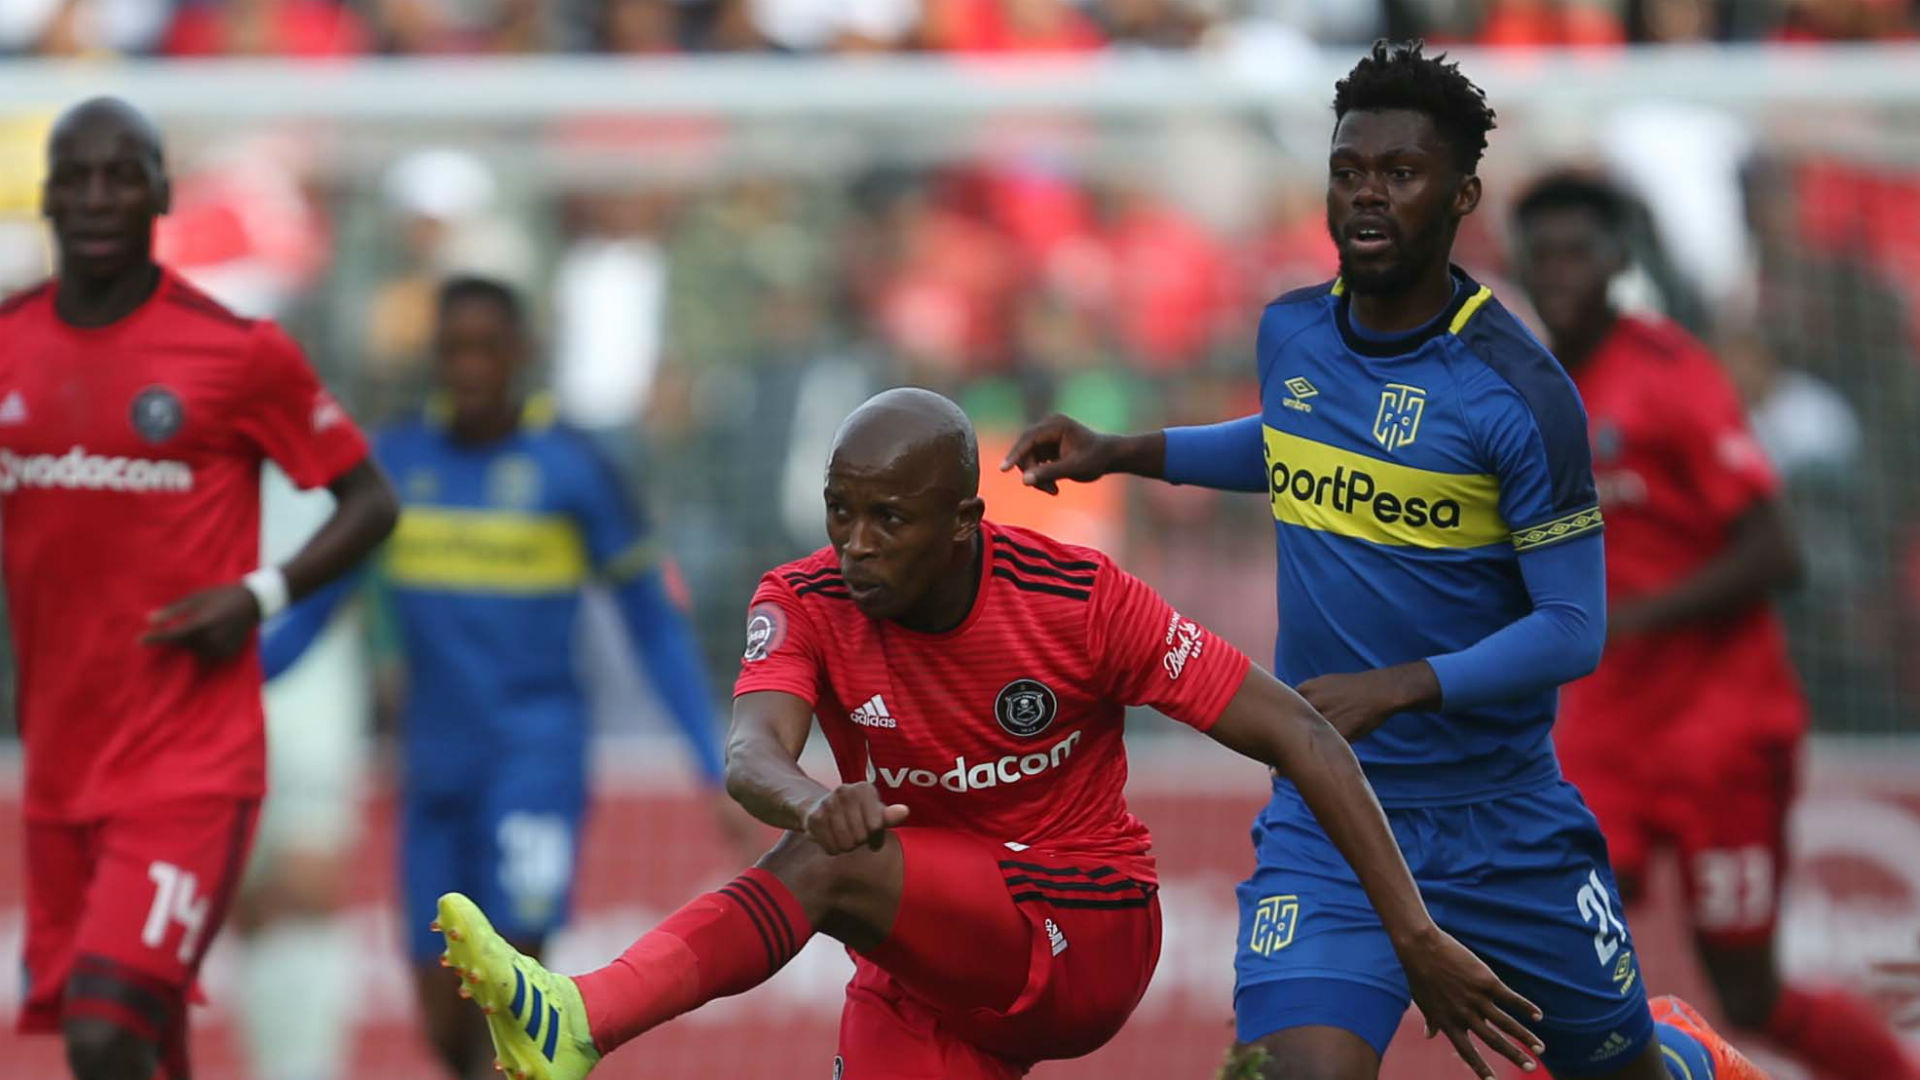 Luvuyo Memela, Orlando Pirates & Thato Mokeke, Cape Town City, May 2019